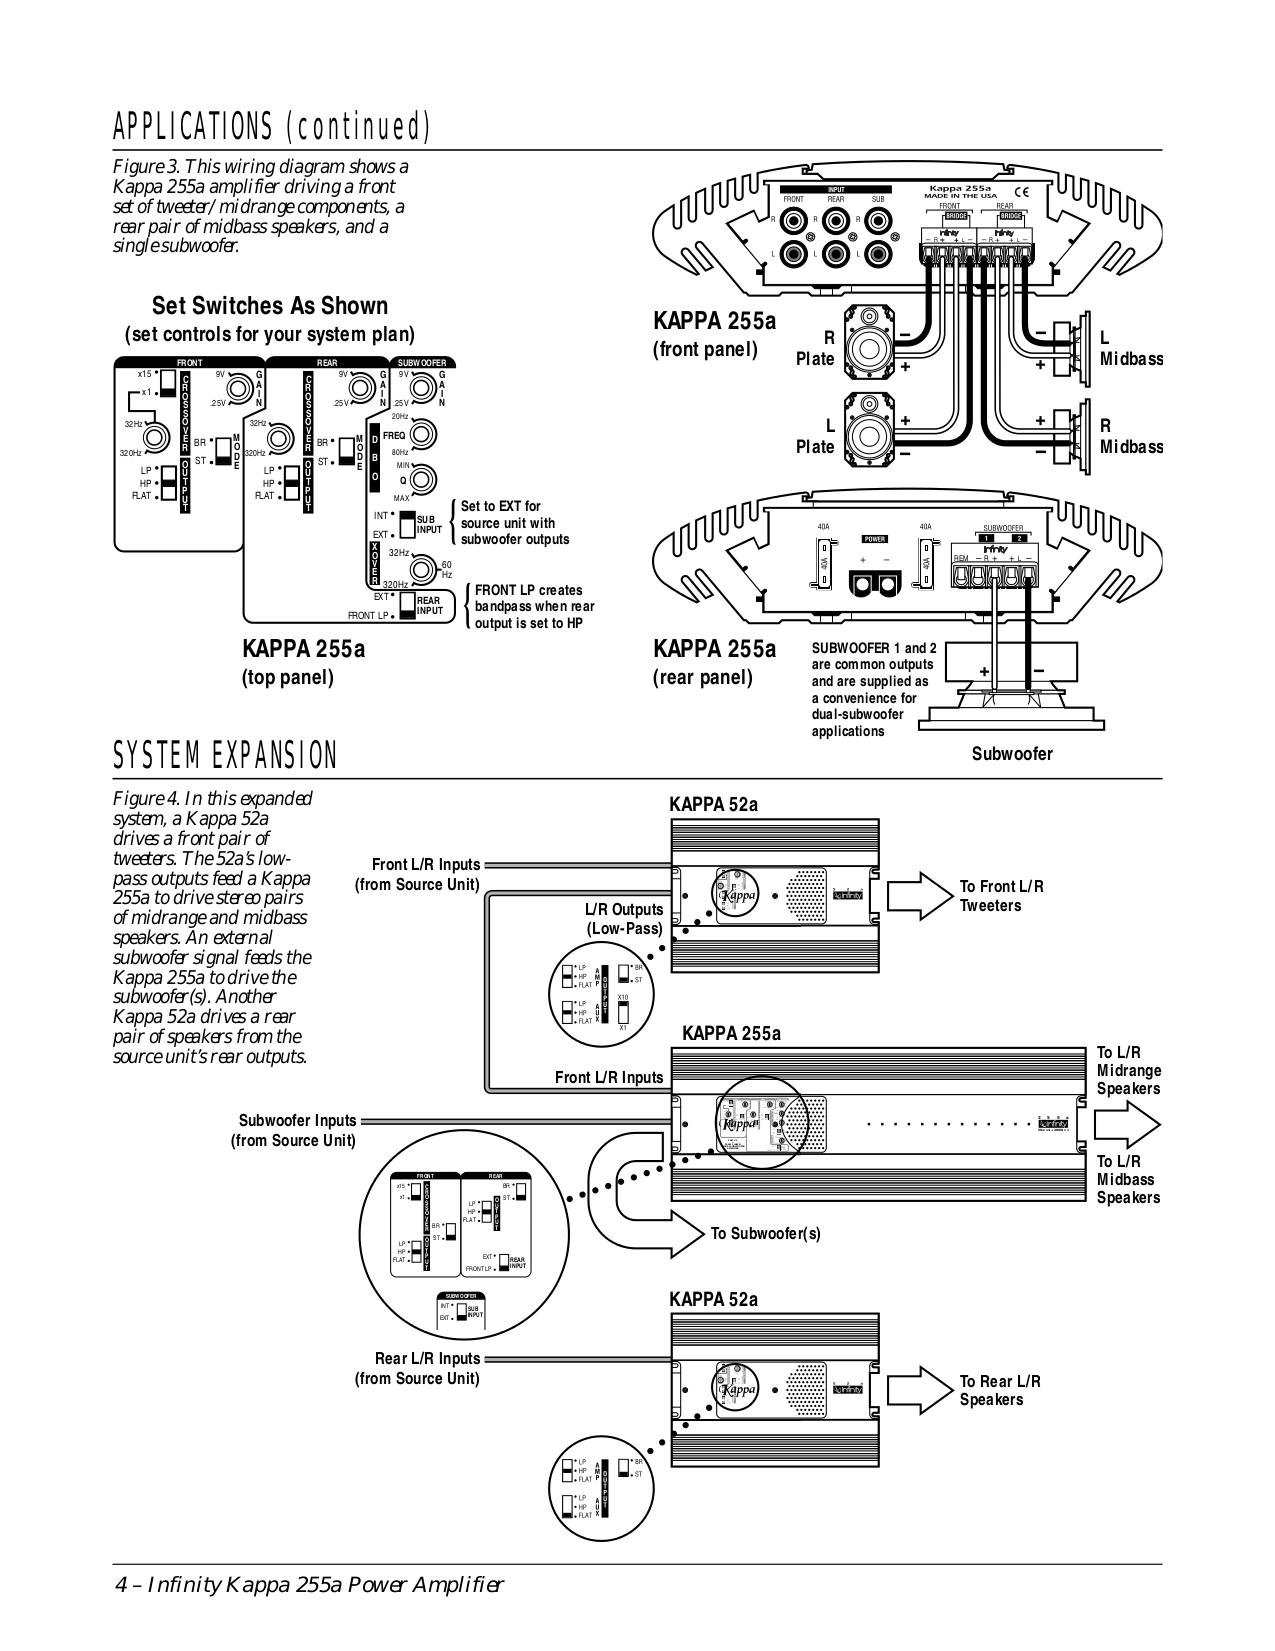 Infinity Kappa 60csx Wiring Diagram